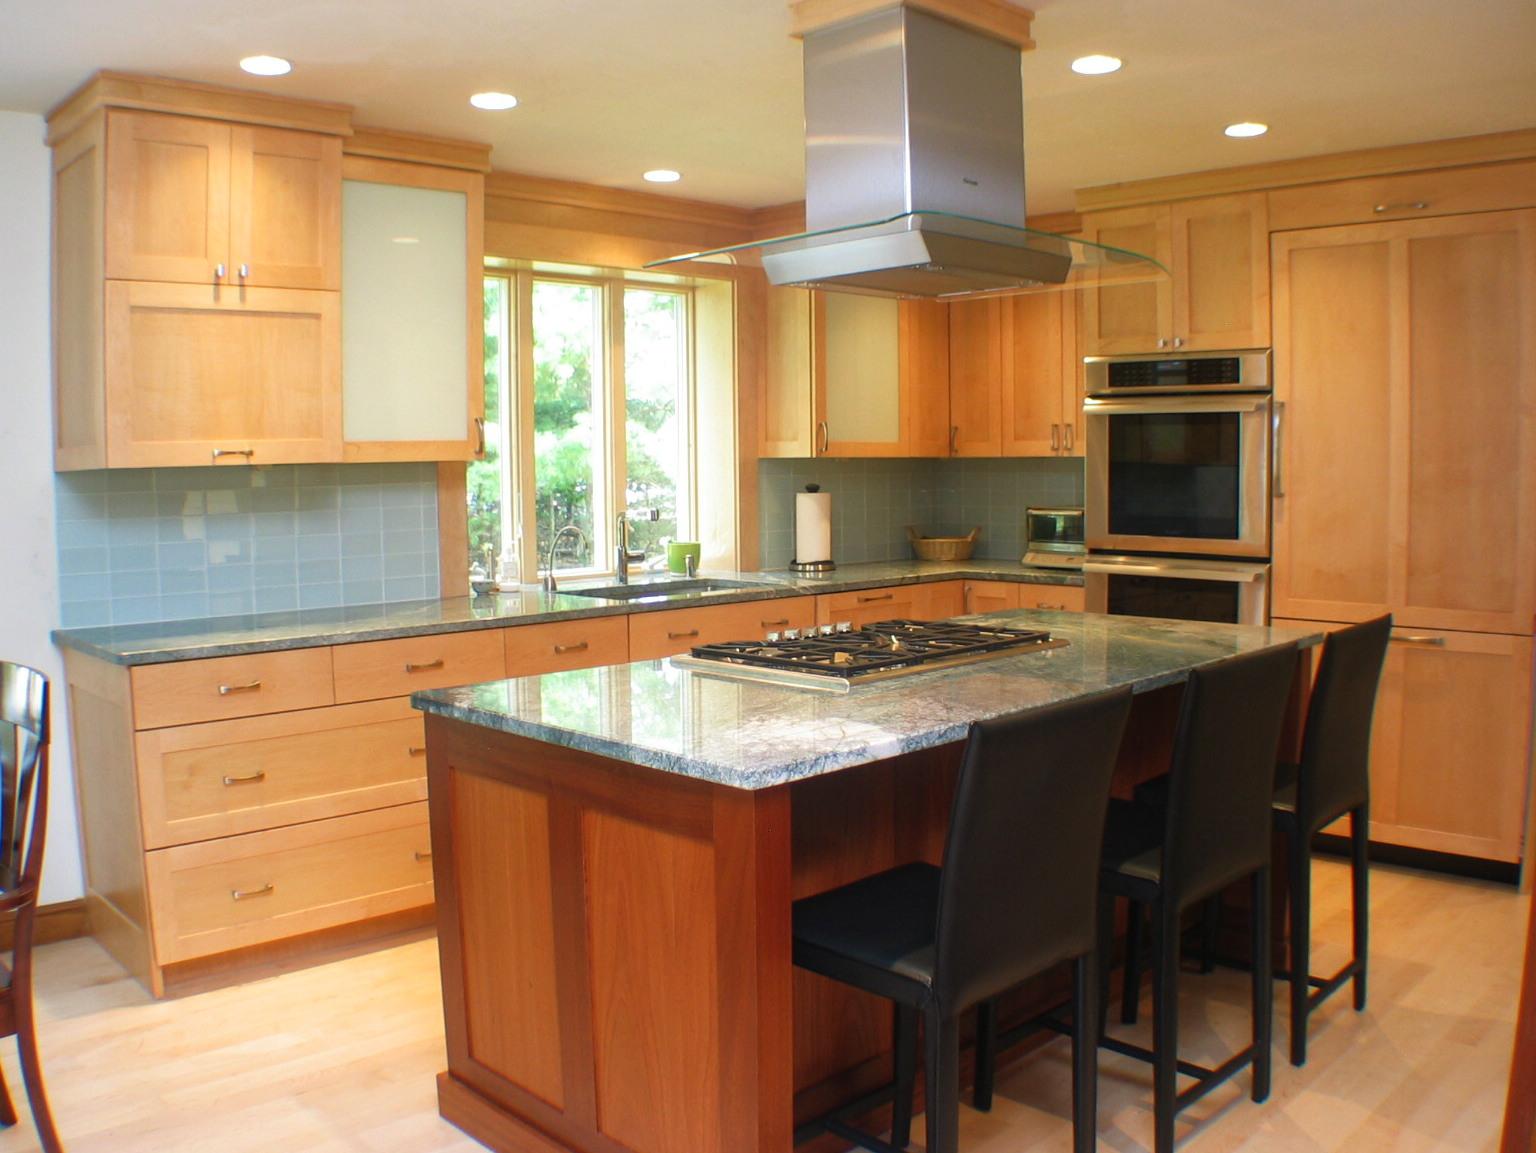 Custom Cabinet Maker Woodworker And Cabinets Newton Massachusetts